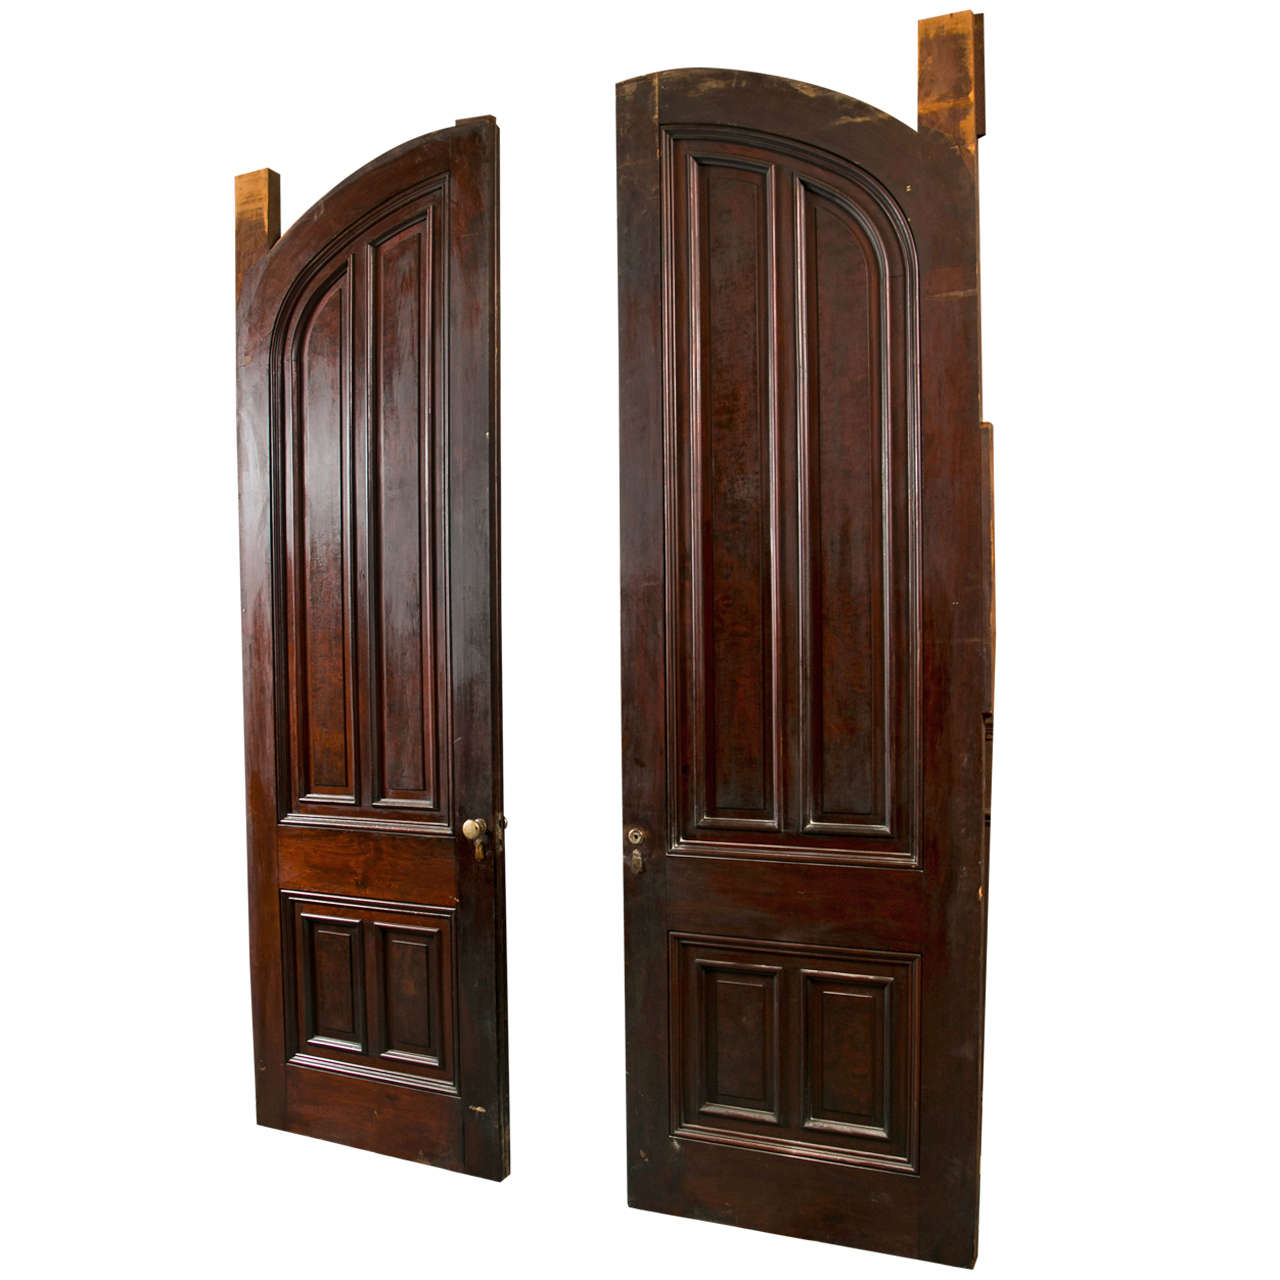 Antique walnut raised panel pocket doors at 1stdibs for Glass pocket doors for sale